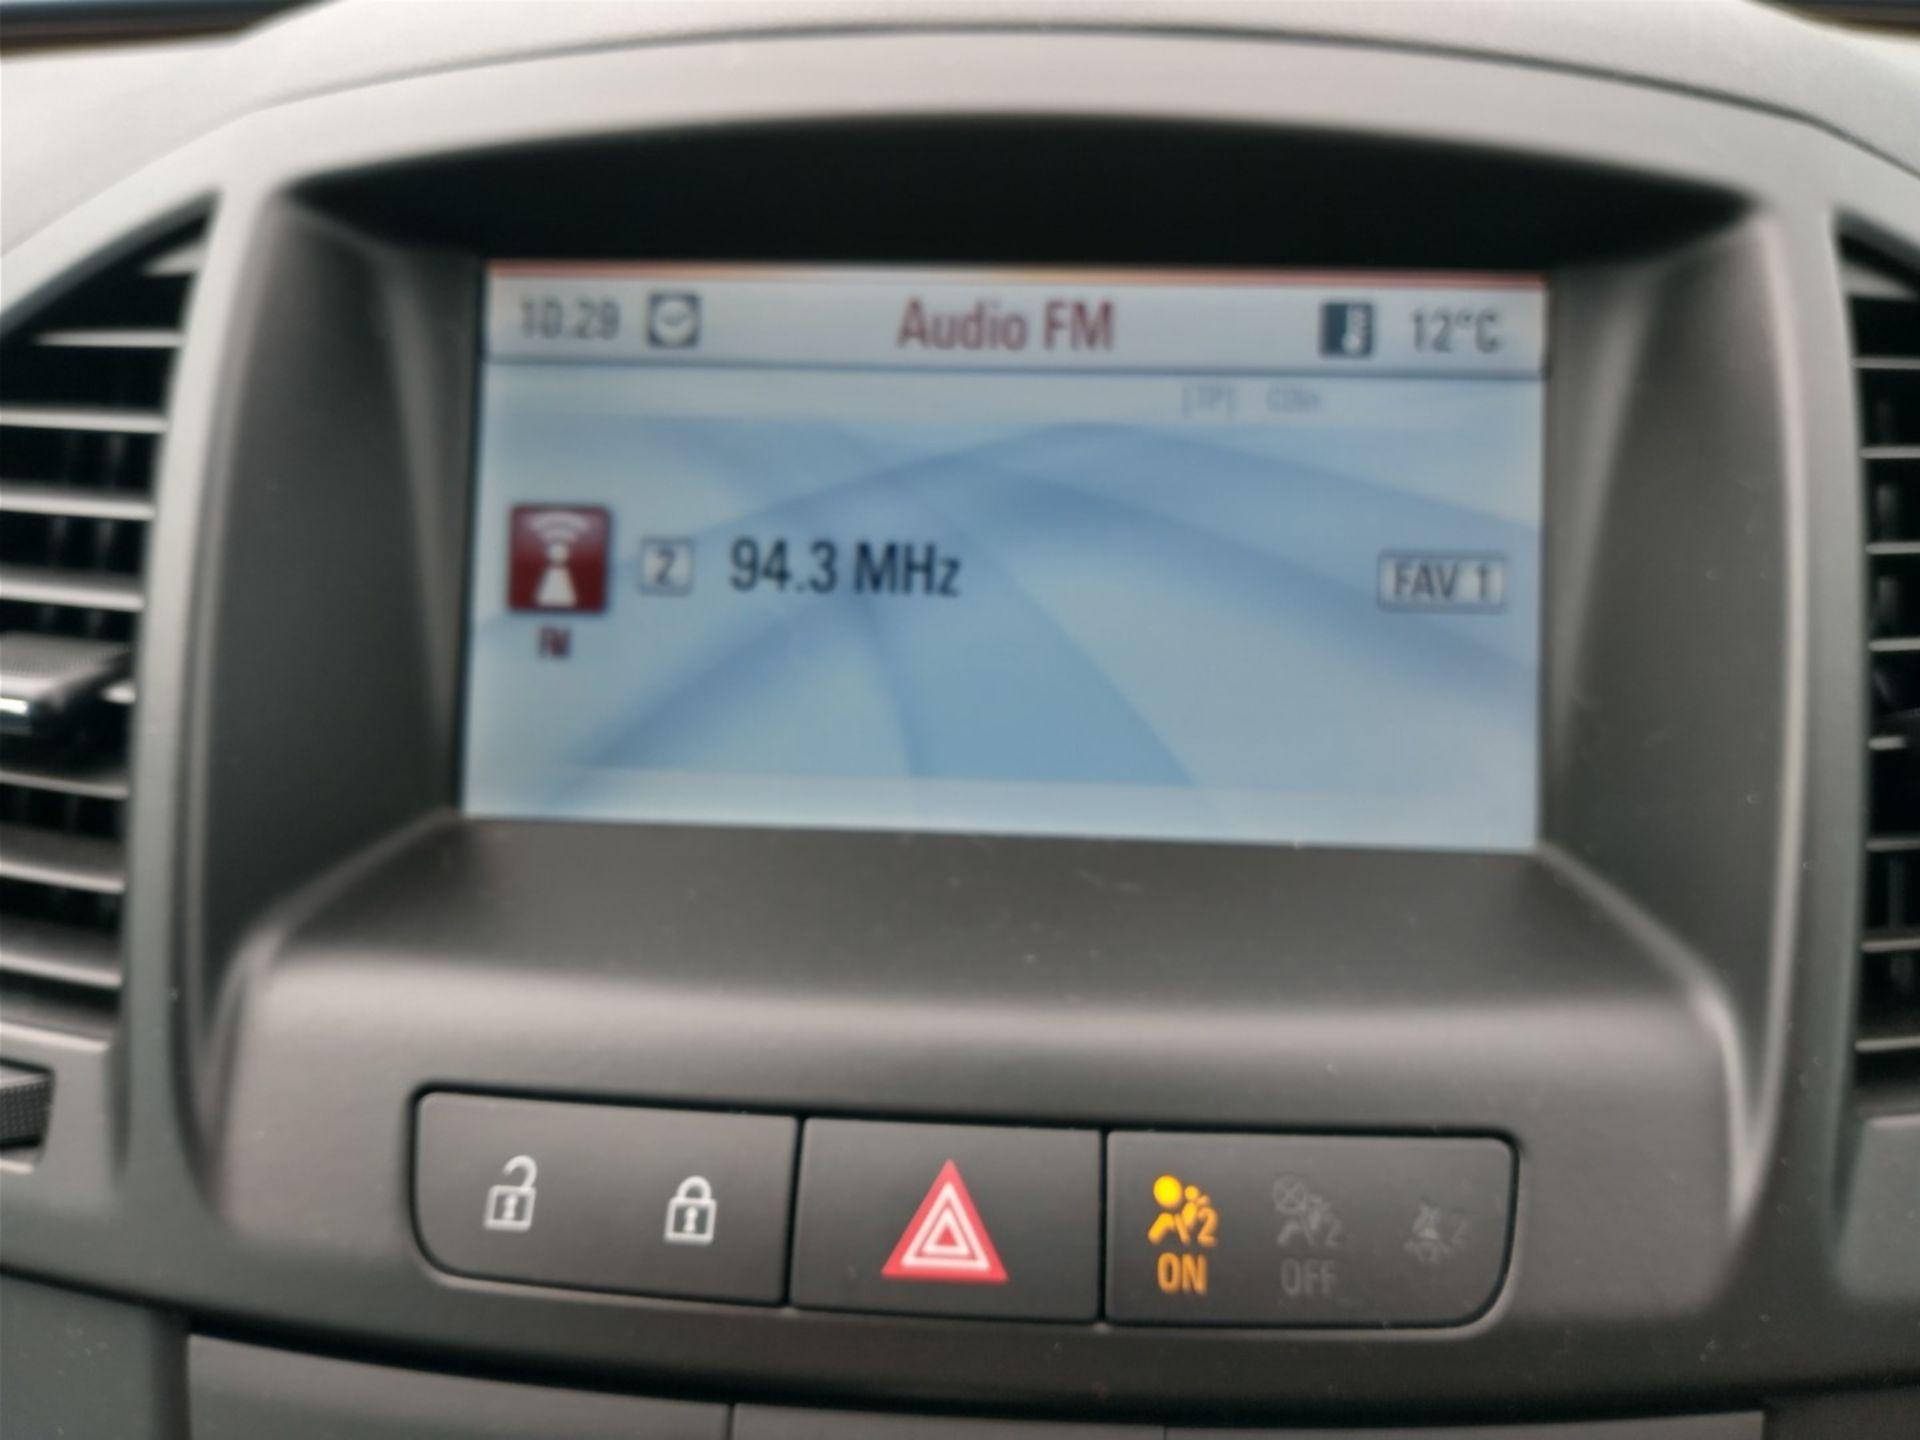 2009 Vauxhall Insignia Elite Nav CDTI 5dr 2.0 Diesel - CL505 - NO VAT ON THE HAMMER - Location: Corb - Image 21 of 22